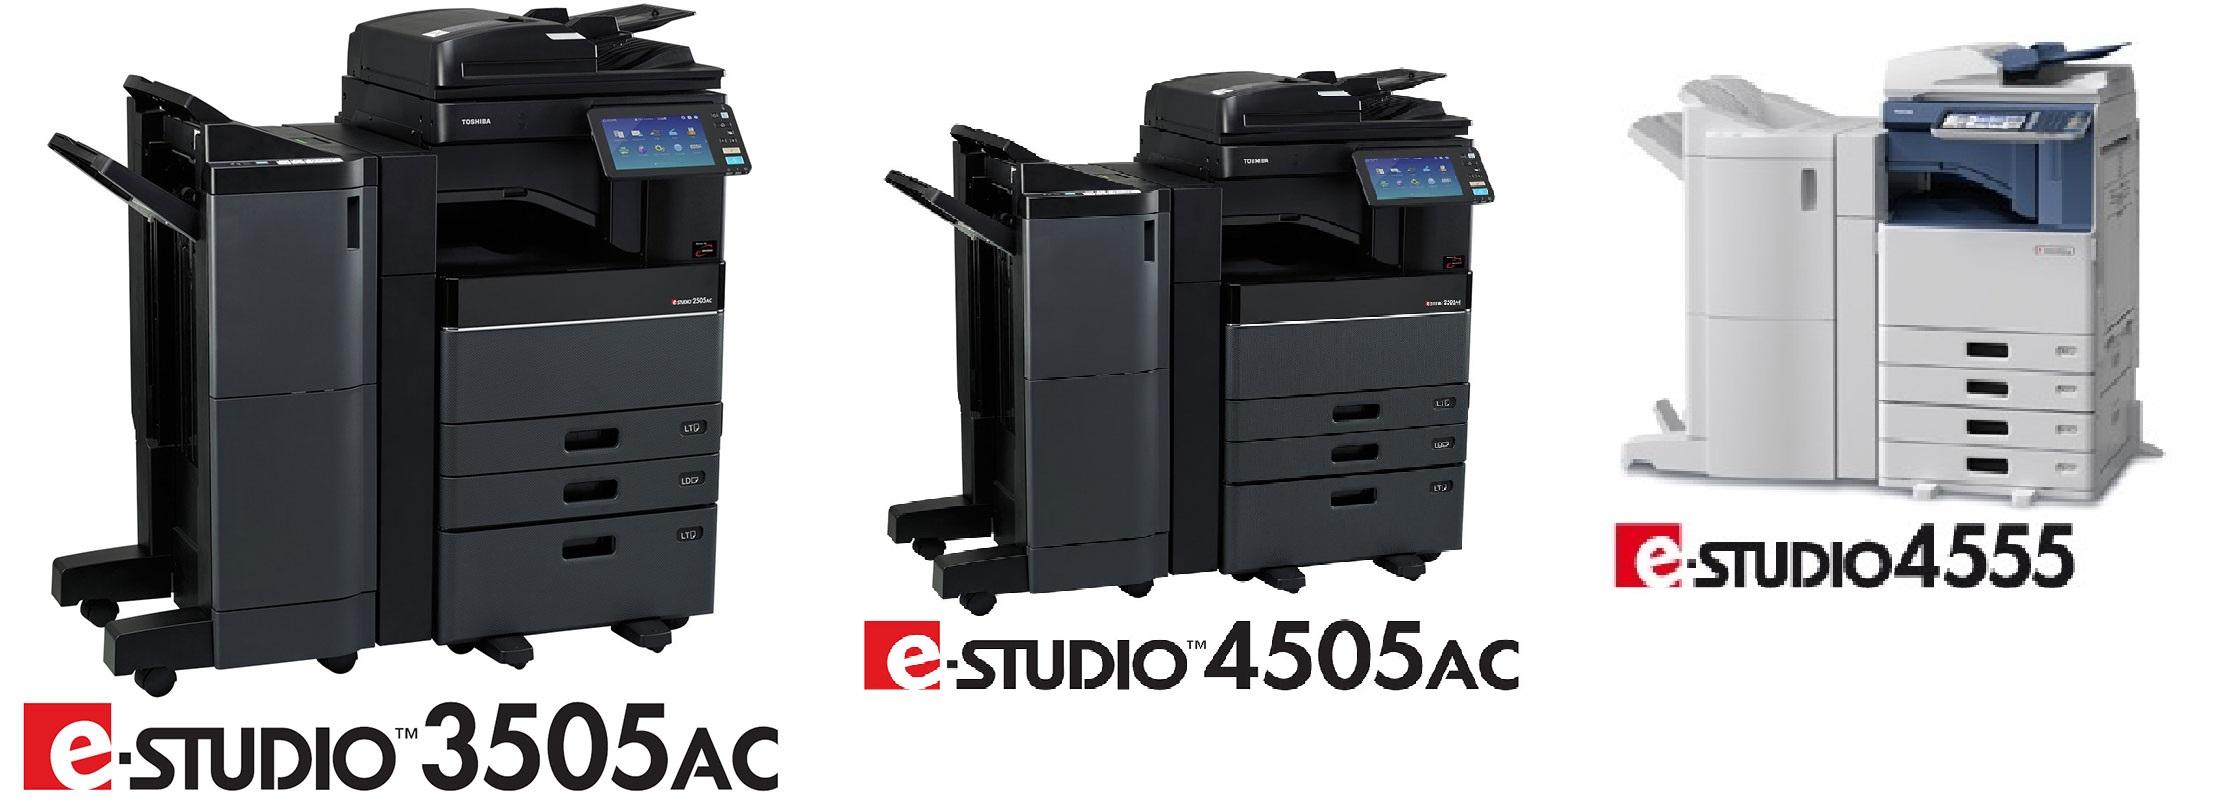 Máy photocopy Toshiba màu E-studio 3505AC/4505AC/4555AC